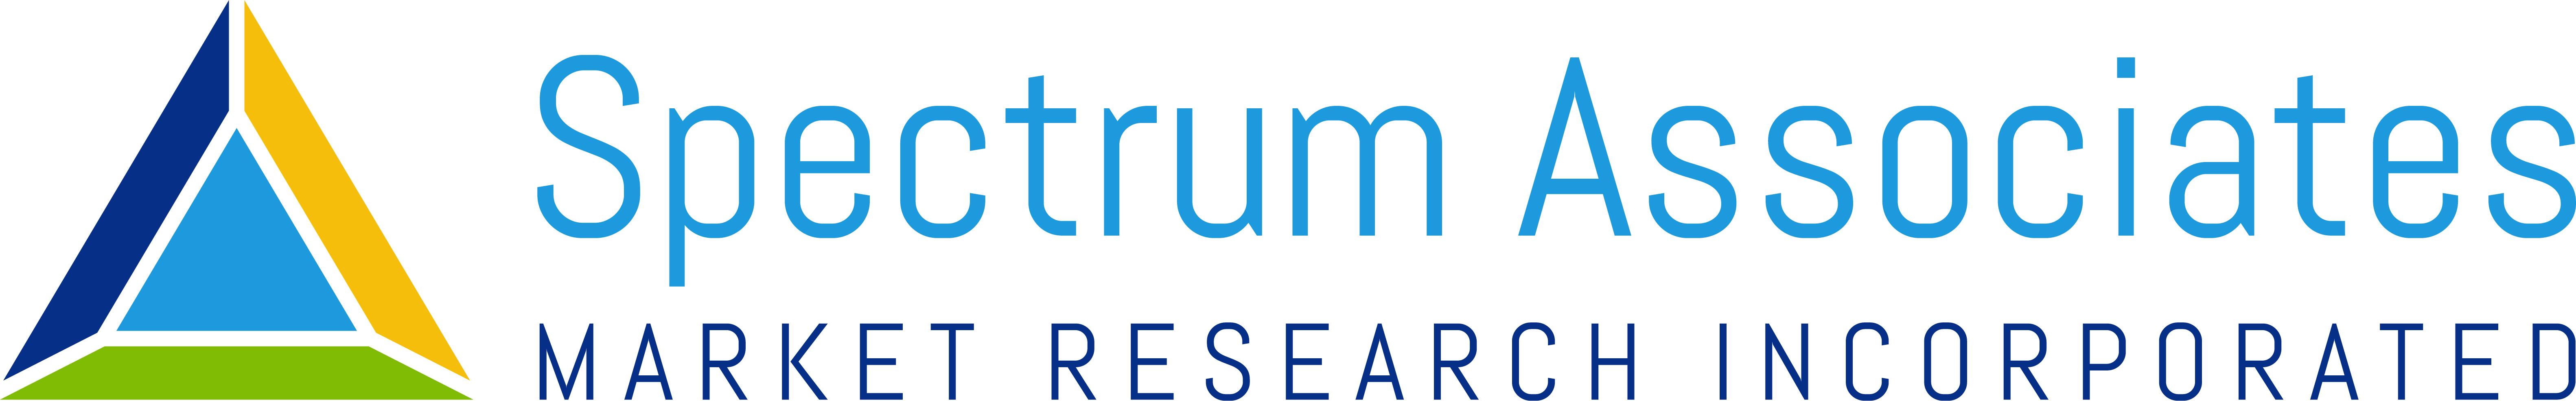 Spectrum Associates Market Research, Inc.